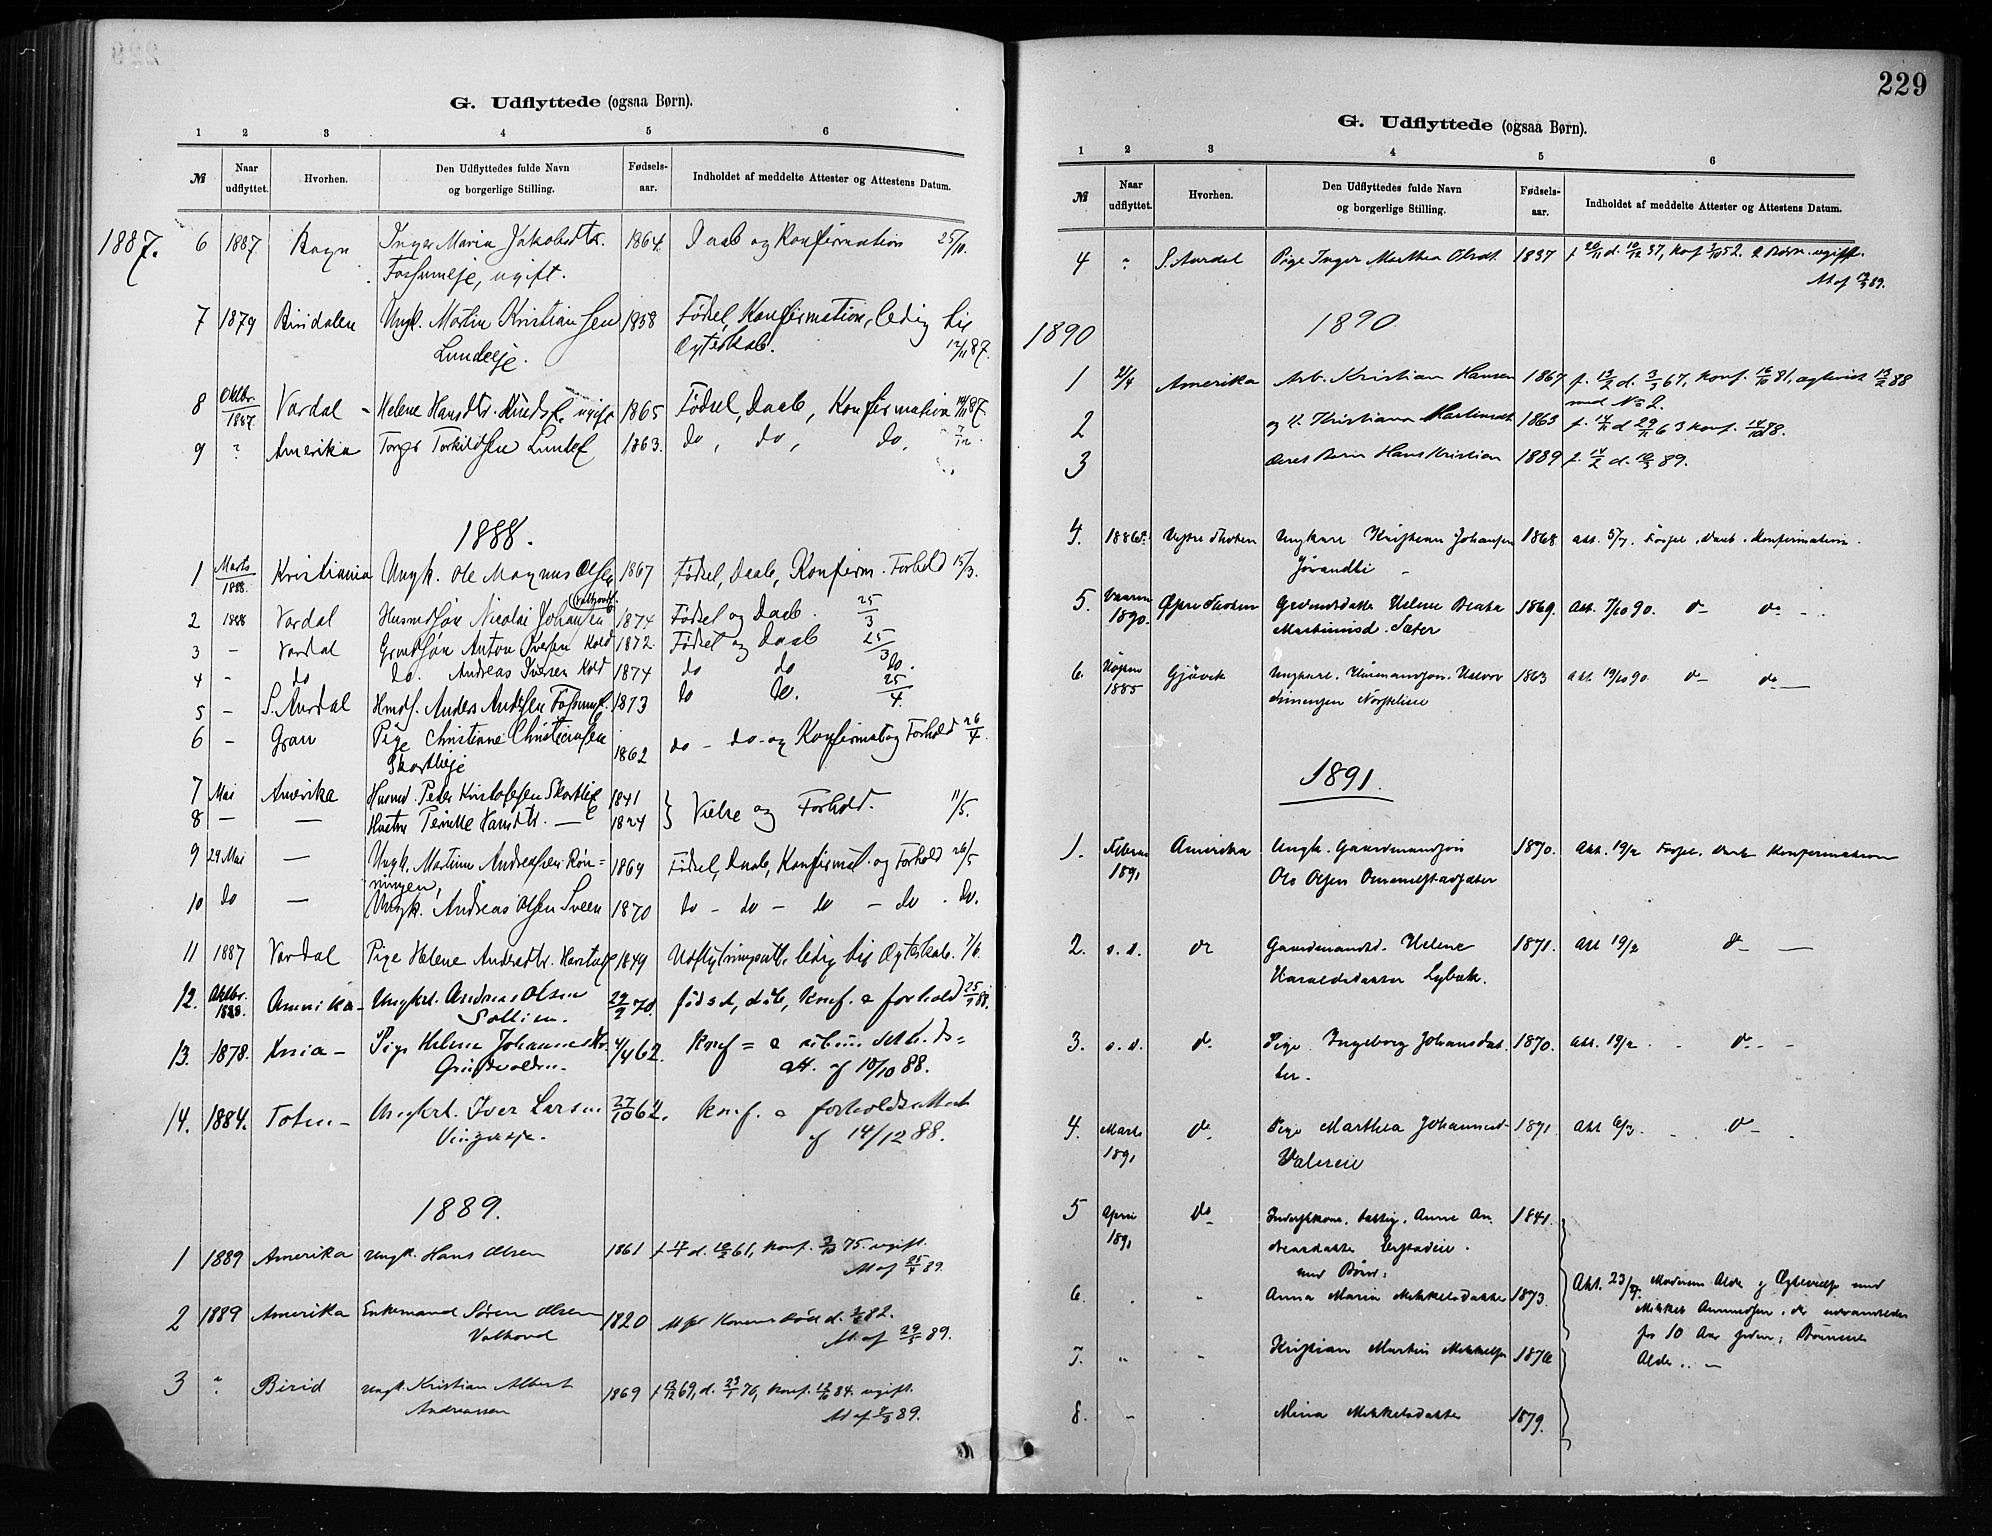 SAH, Nordre Land prestekontor, Ministerialbok nr. 4, 1882-1896, s. 229